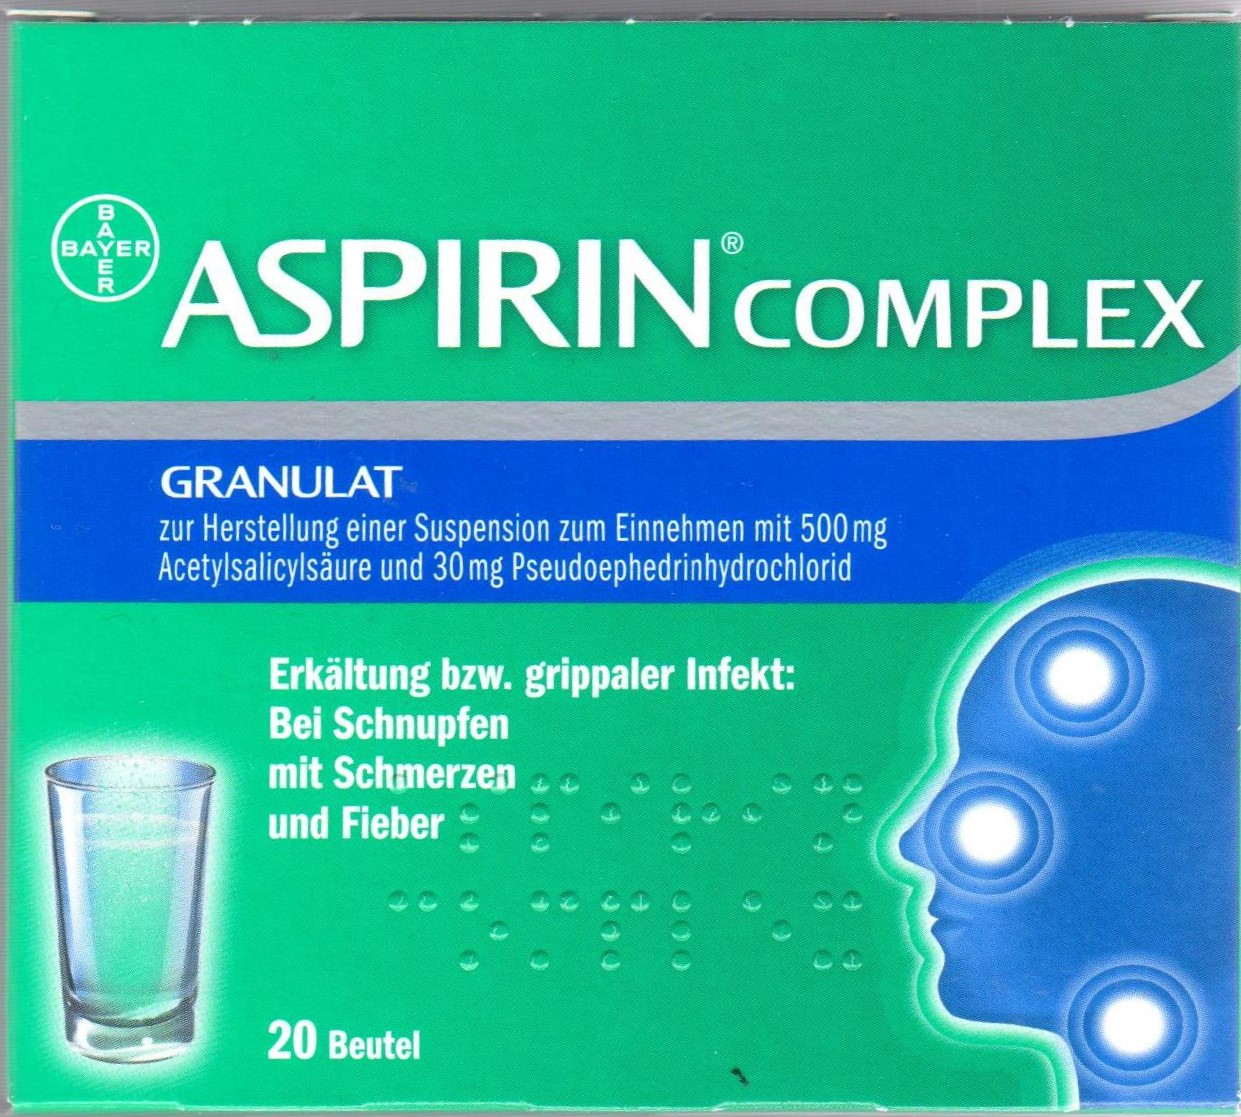 Aspirin complex Beutel 20 St PZN 04114918 Erkältung